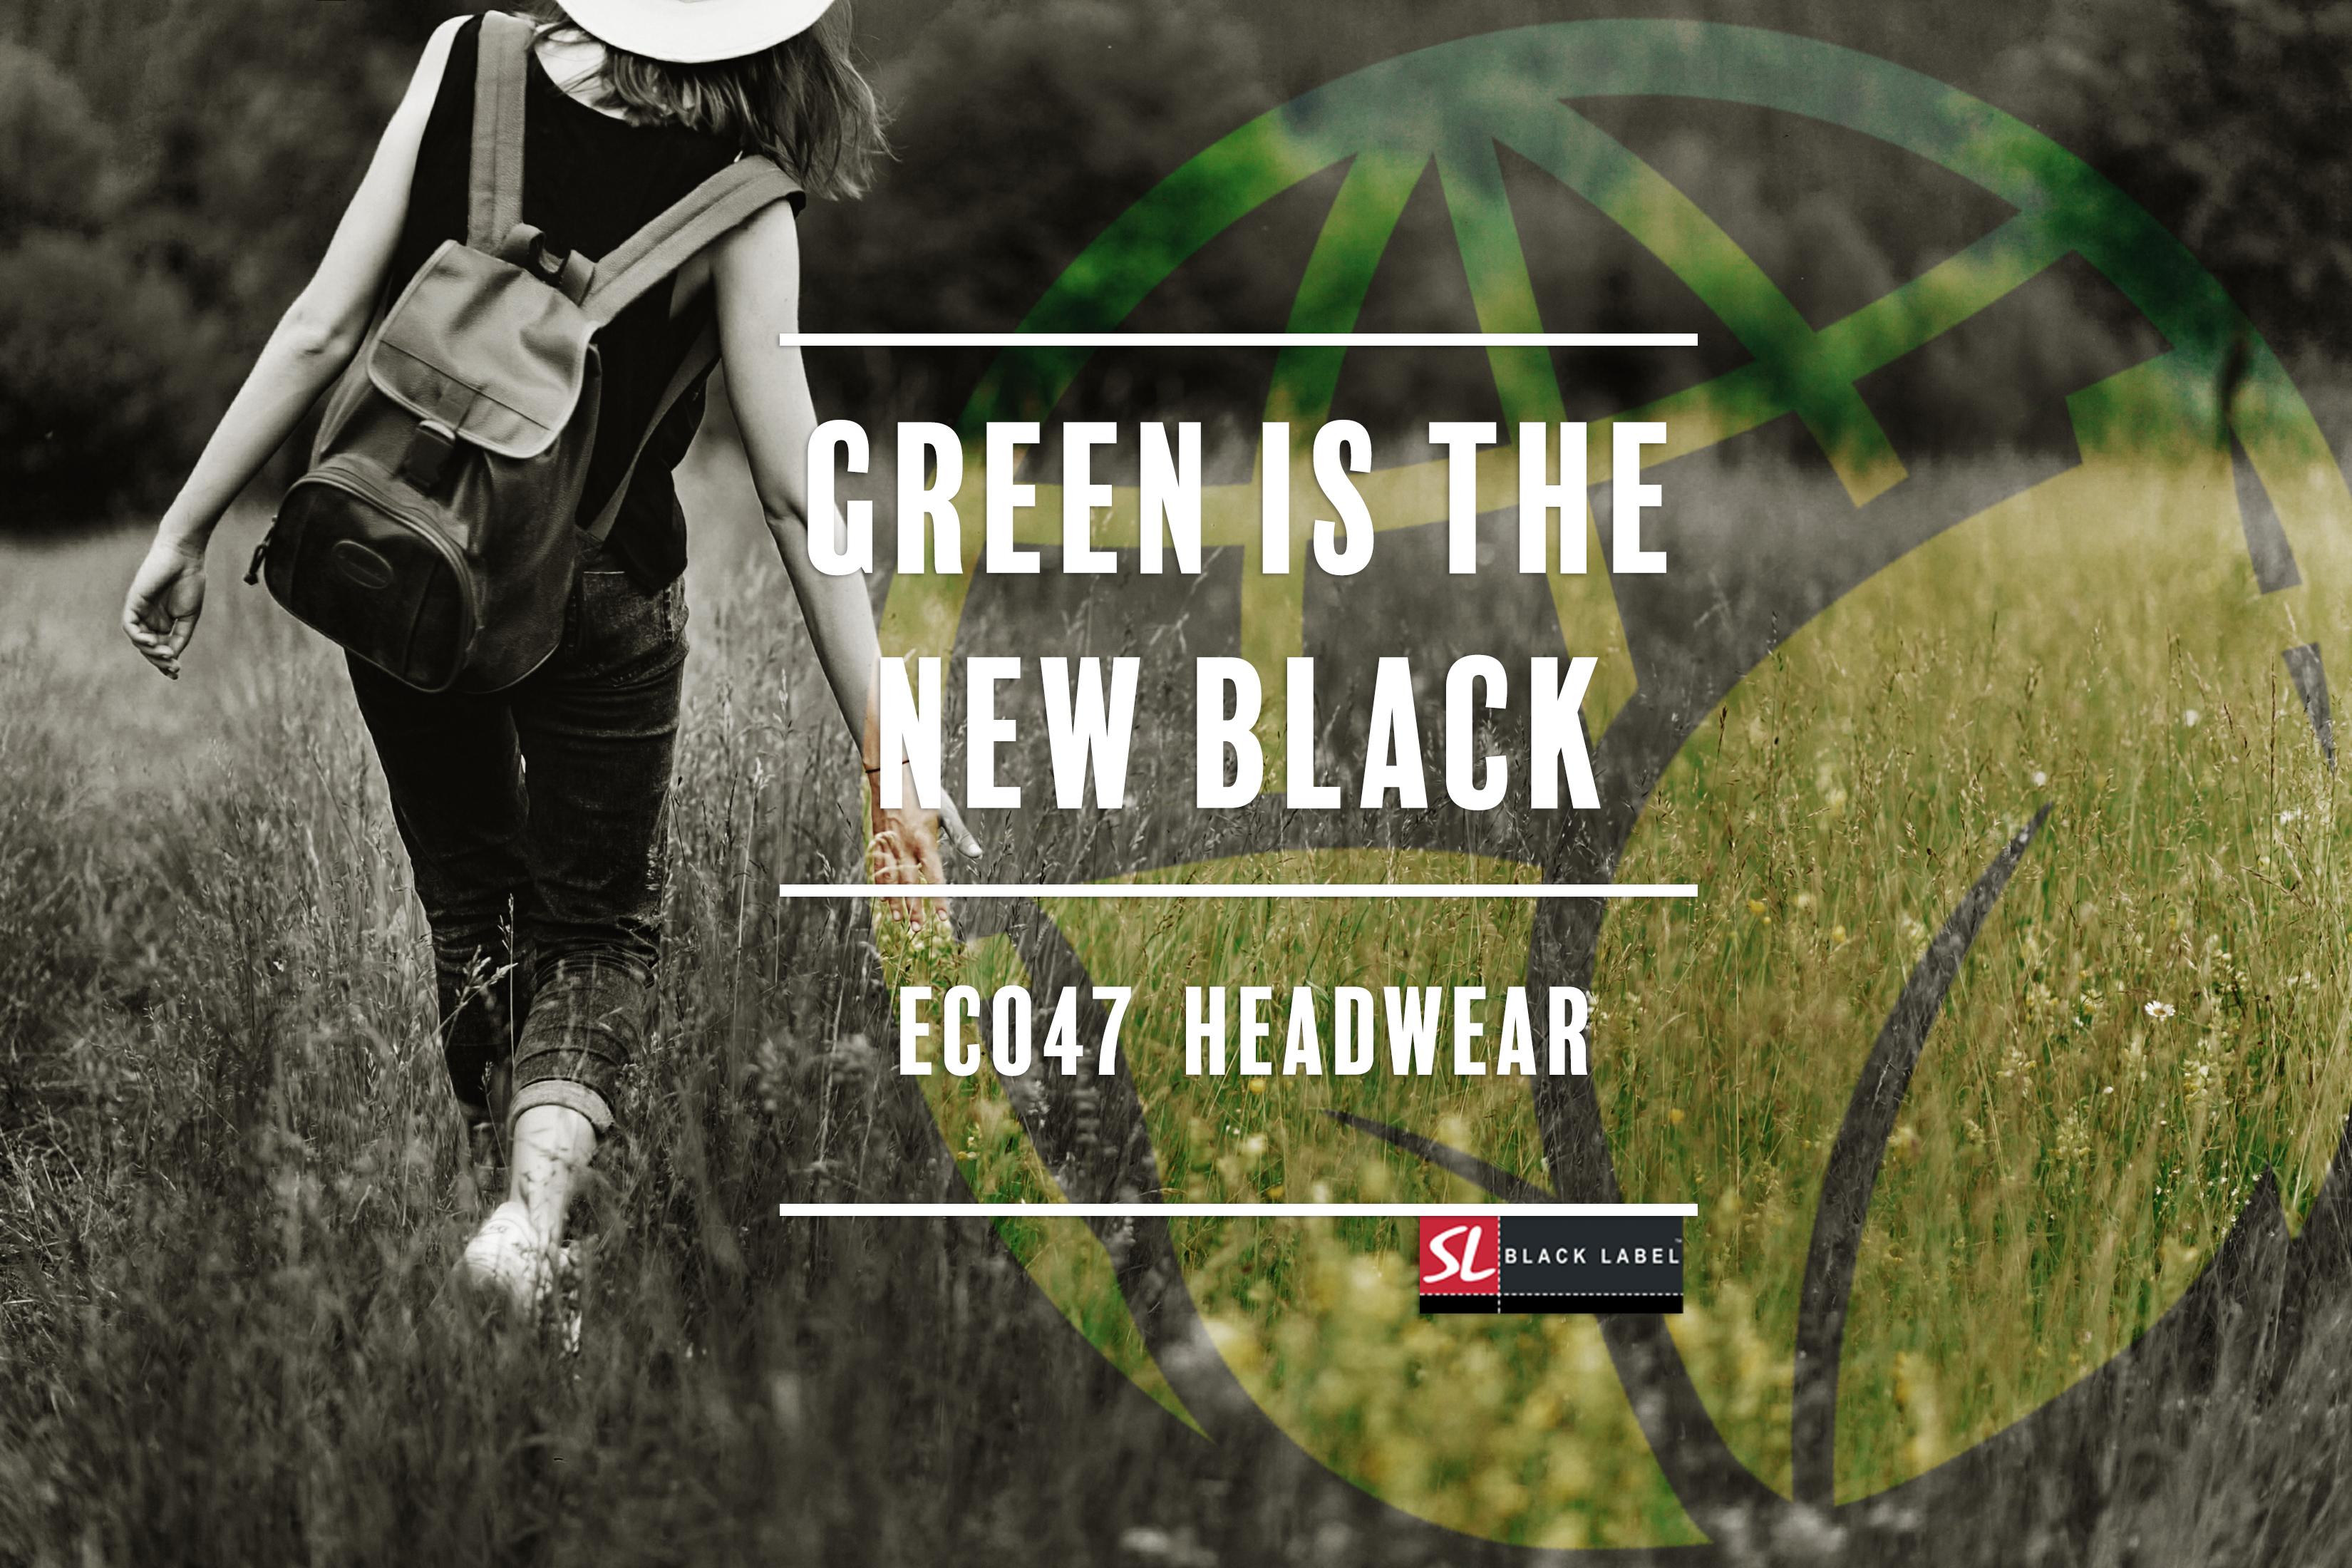 ECO47 Headwear